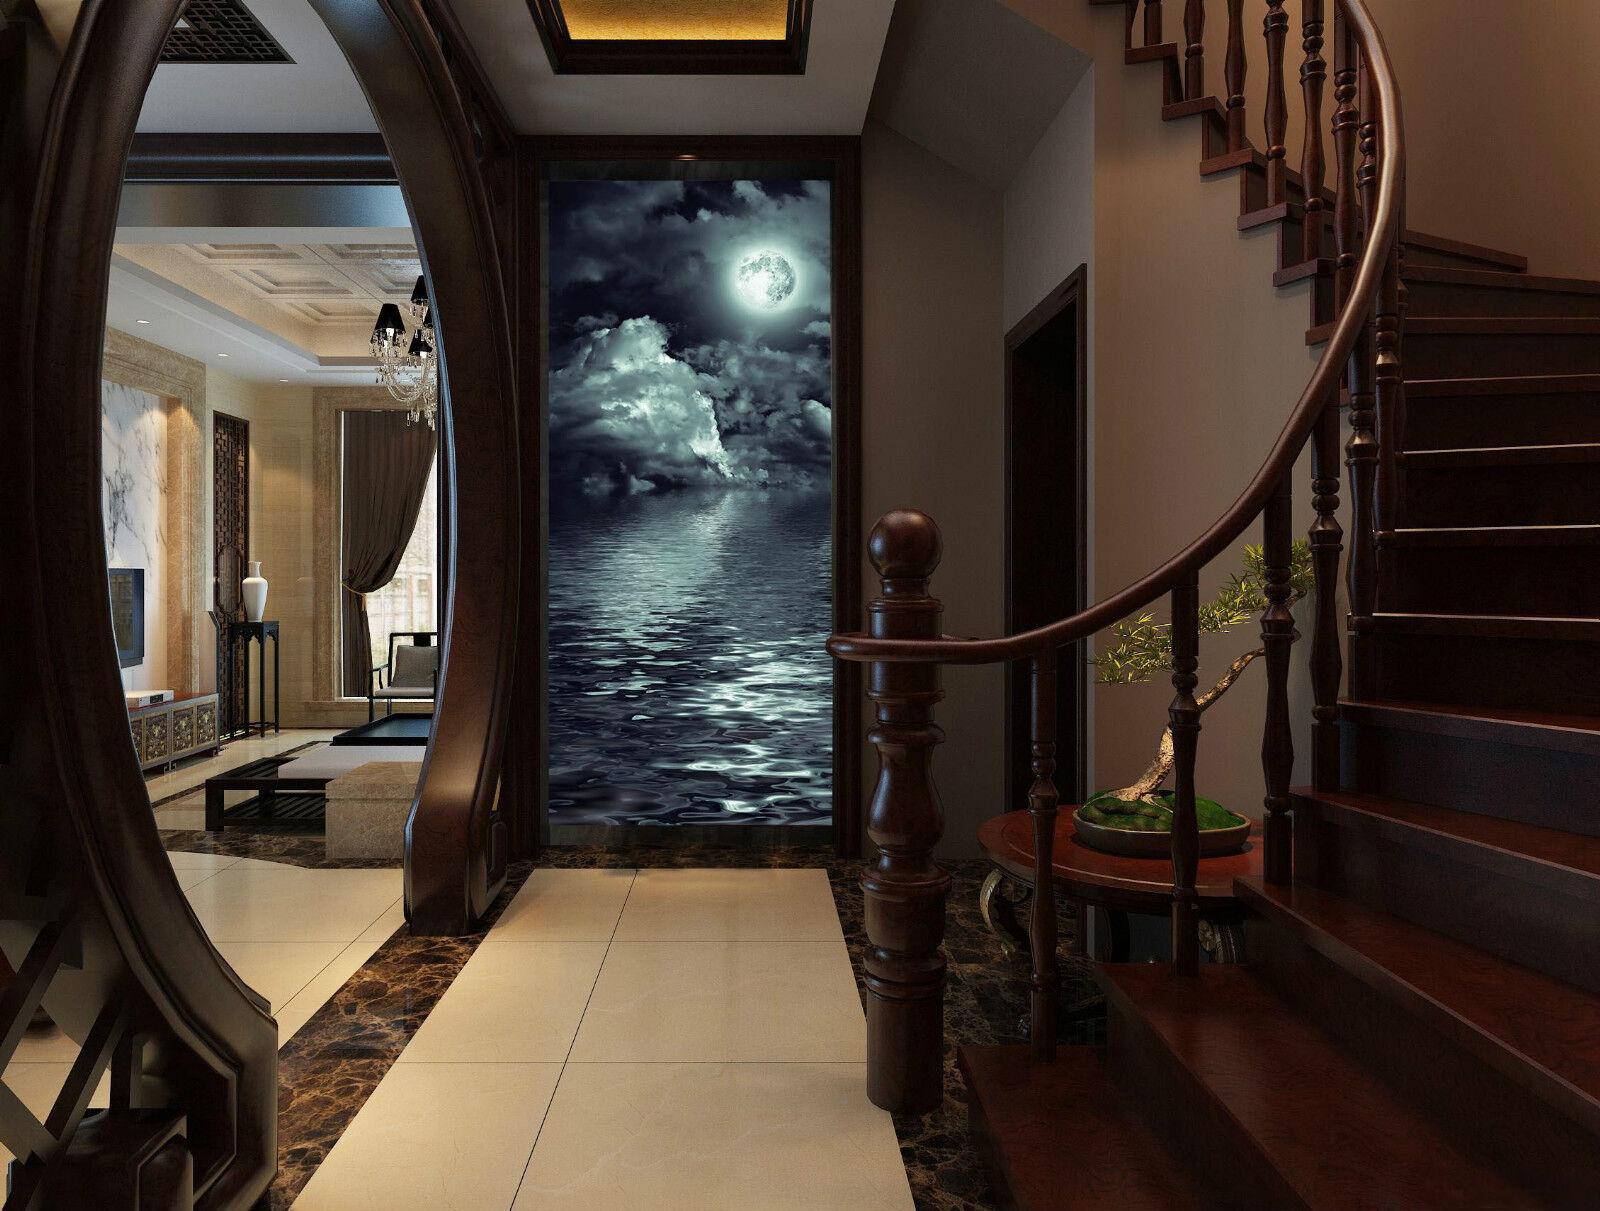 3D In der der der Nacht,  SEE 4329 Fototapeten Wandbild Fototapete BildTapete Familie DE 0db627